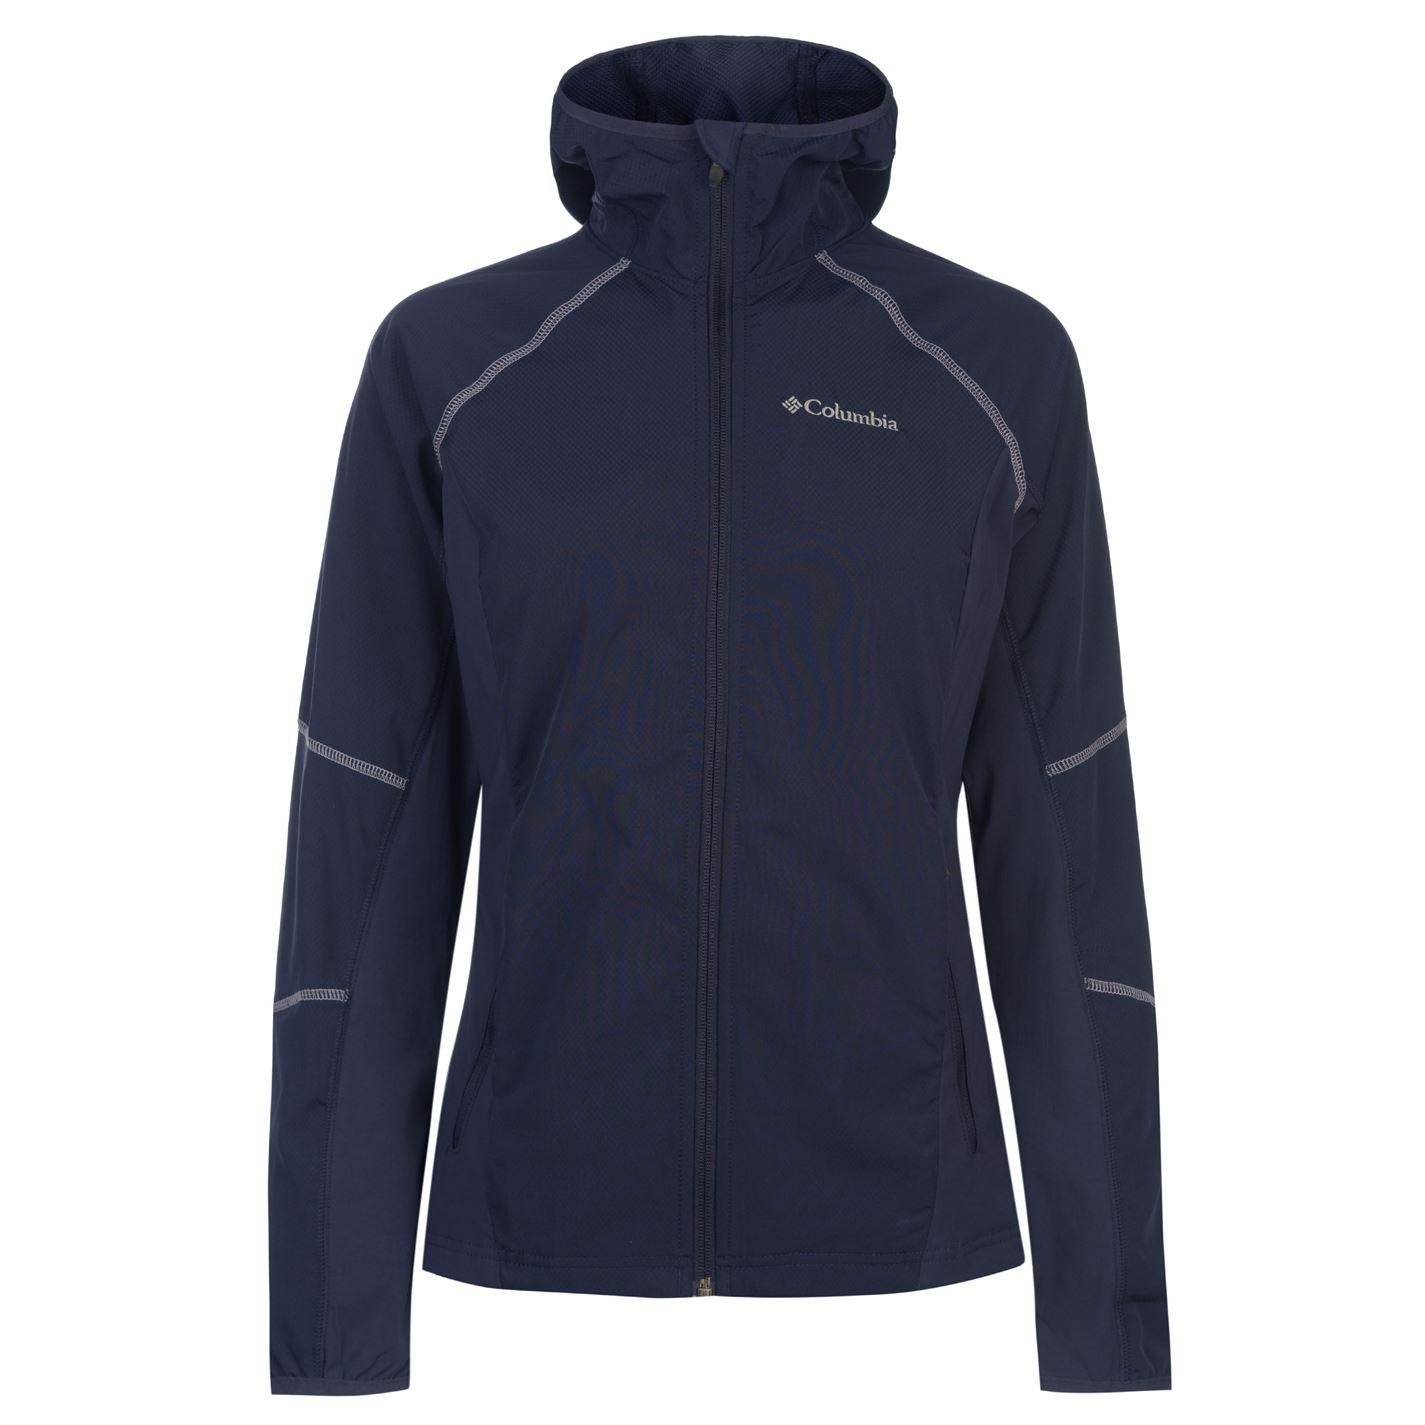 Columbia Snowfall Softshell Jacket Ladies